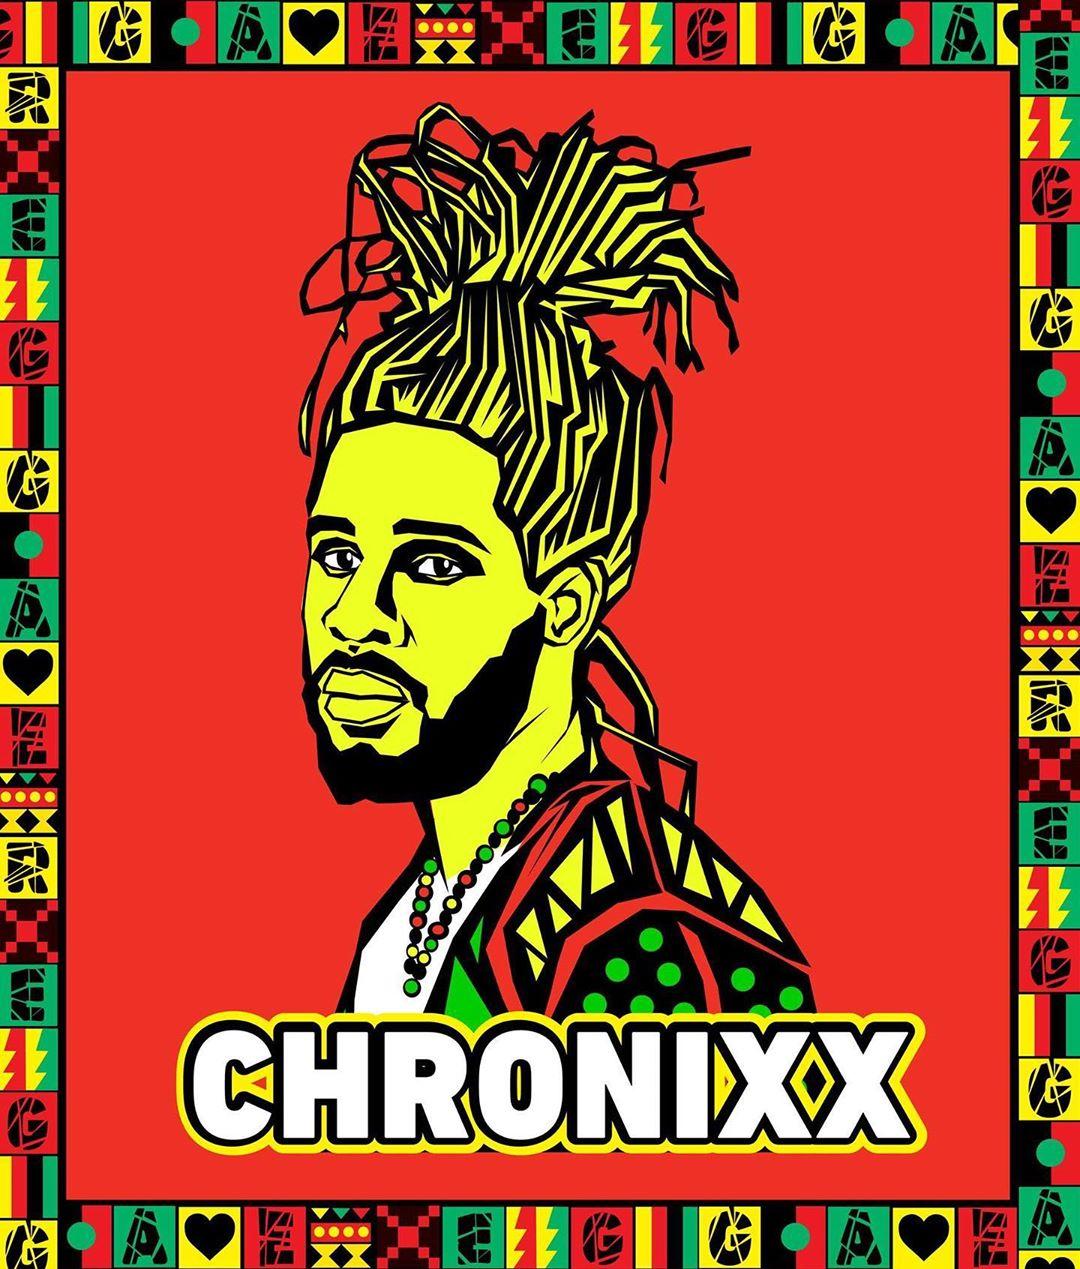 chronixx reggae rotterdam